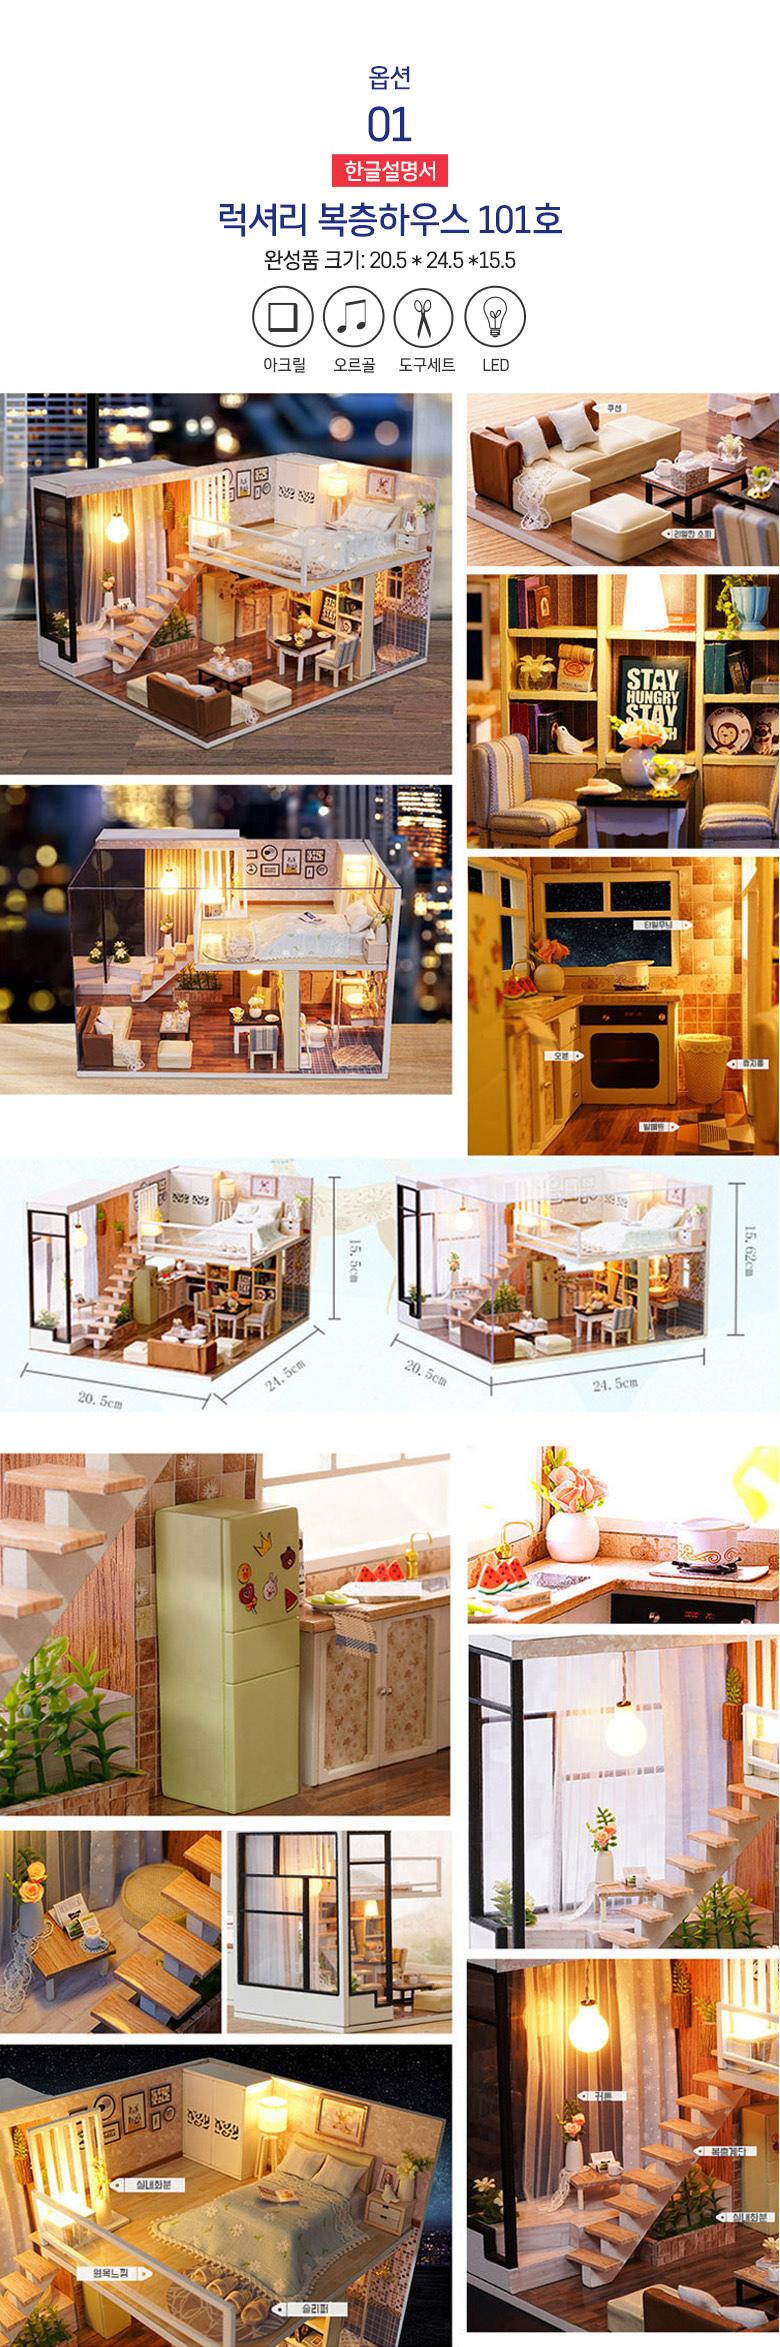 DIY 미니어쳐 하우스 만들기 럭셔리복층하우스101호 - 옥탑방어른이, 26,300원, 미니어처 DIY, 미니어처 만들기 패키지